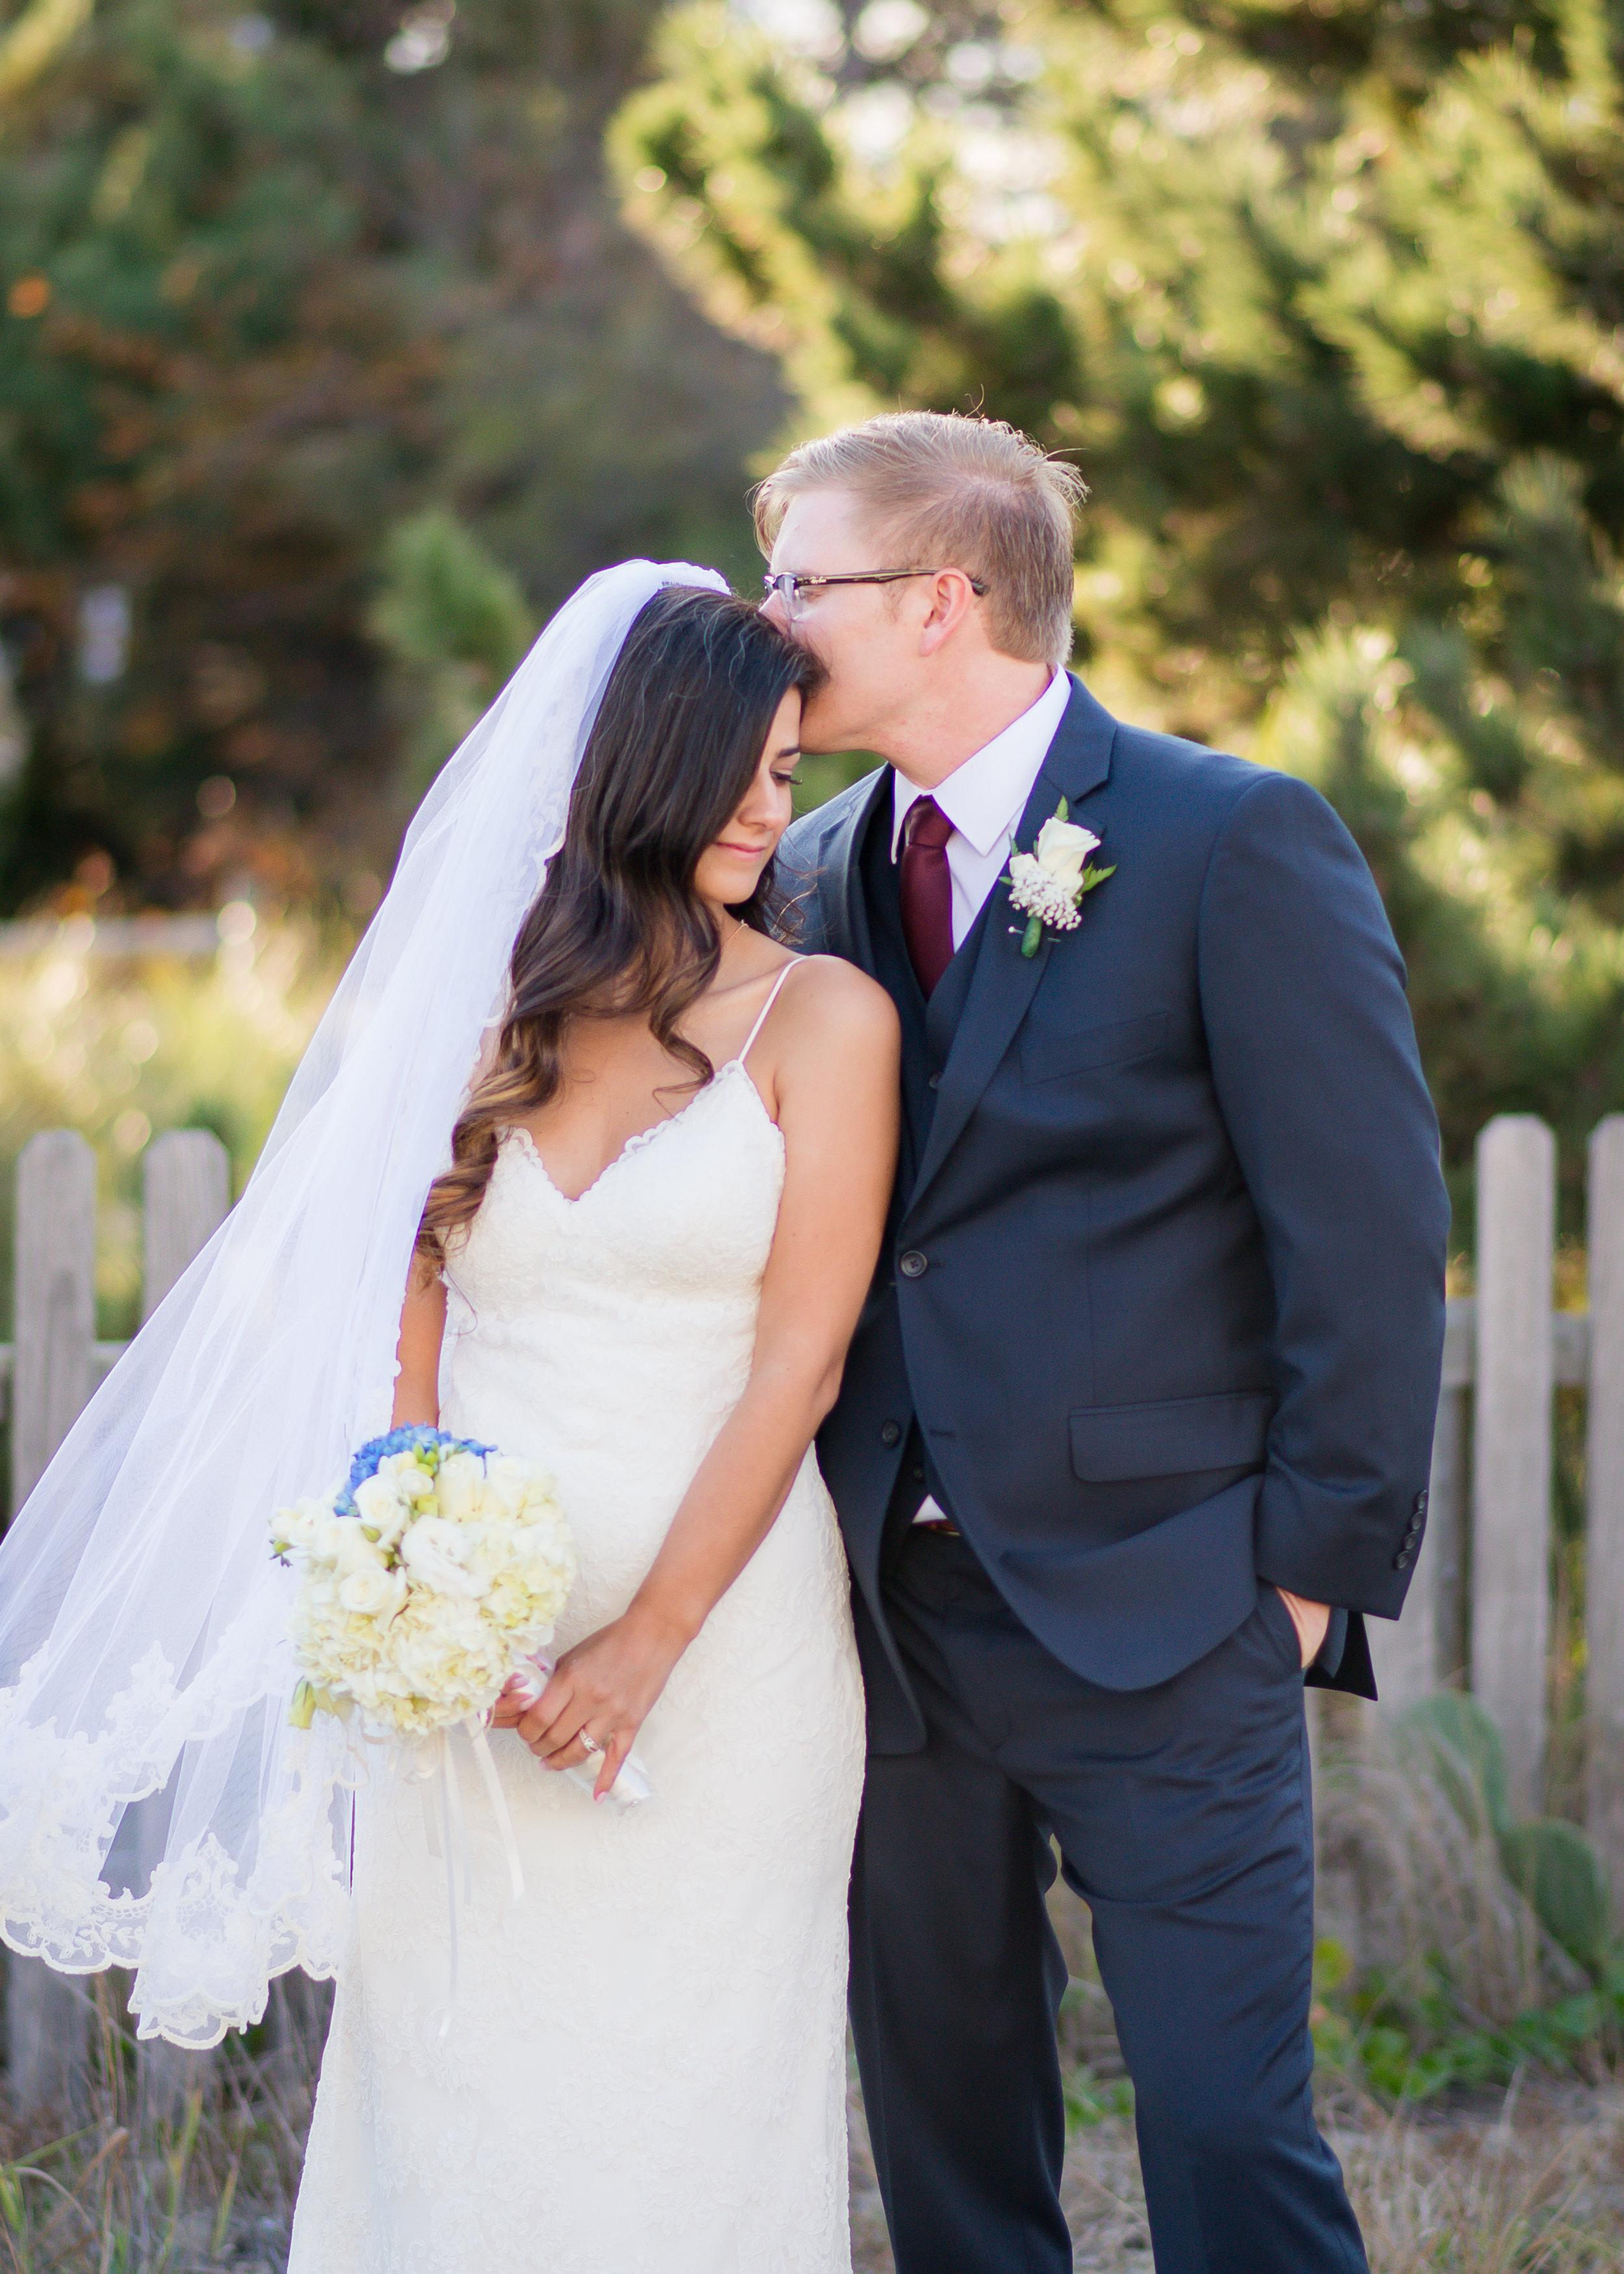 Erica + Robert Married384 copy.jpg